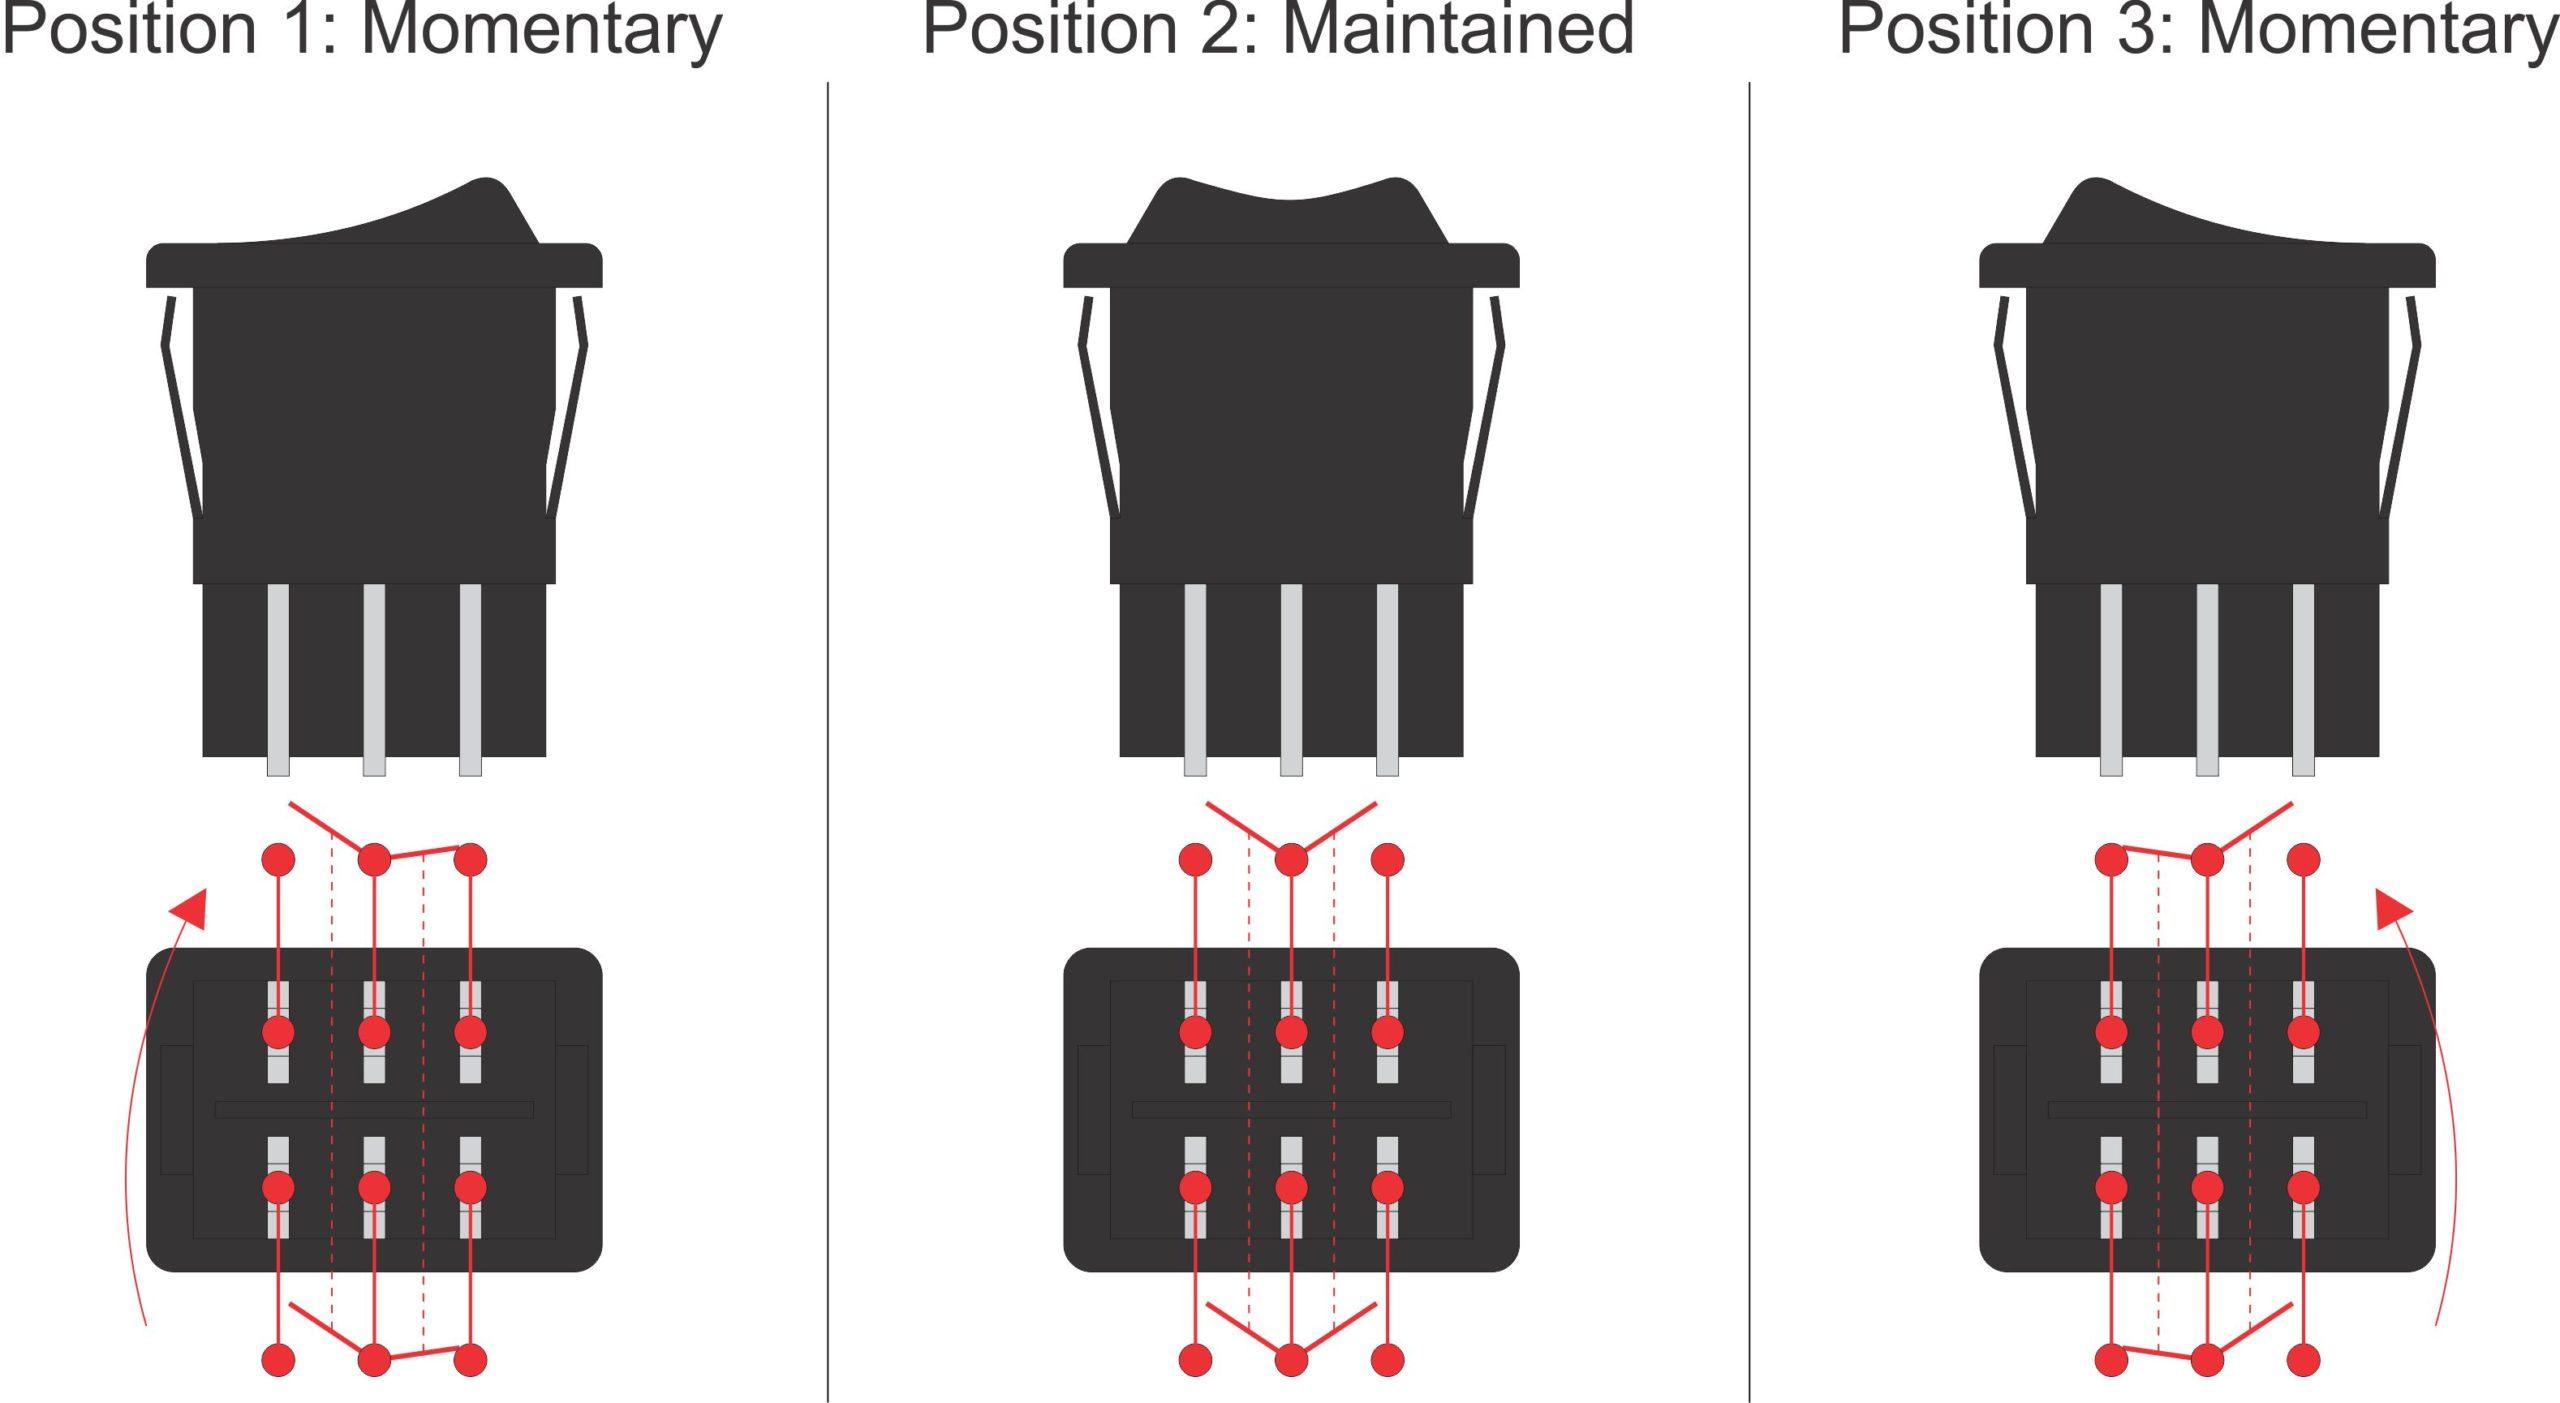 66PI-1  Position Spst Rocker Switch Wiring Diagram on on off on switch wiring diagram, linear actuator switch wiring diagram, spst switch on-off-on wiring, 700r4 vacuum switch installation diagram, 3 position switch wiring diagram, spst illuminated rocker switch wiring, starter switch wiring diagram, 6 prong toggle switch diagram, rotary switch wiring diagram, spst toggle switch wiring, momentary switch wiring diagram, three terminal rocker switch diagram, 3 way switch wiring diagram, lighted toggle switch diagram, dpdt toggle switch diagram, carling dpdt switch wiring diagram, light switch wiring diagram, carling lighted switch wiring diagram, single pole double throw switch wiring diagram, spdt switch wiring diagram,